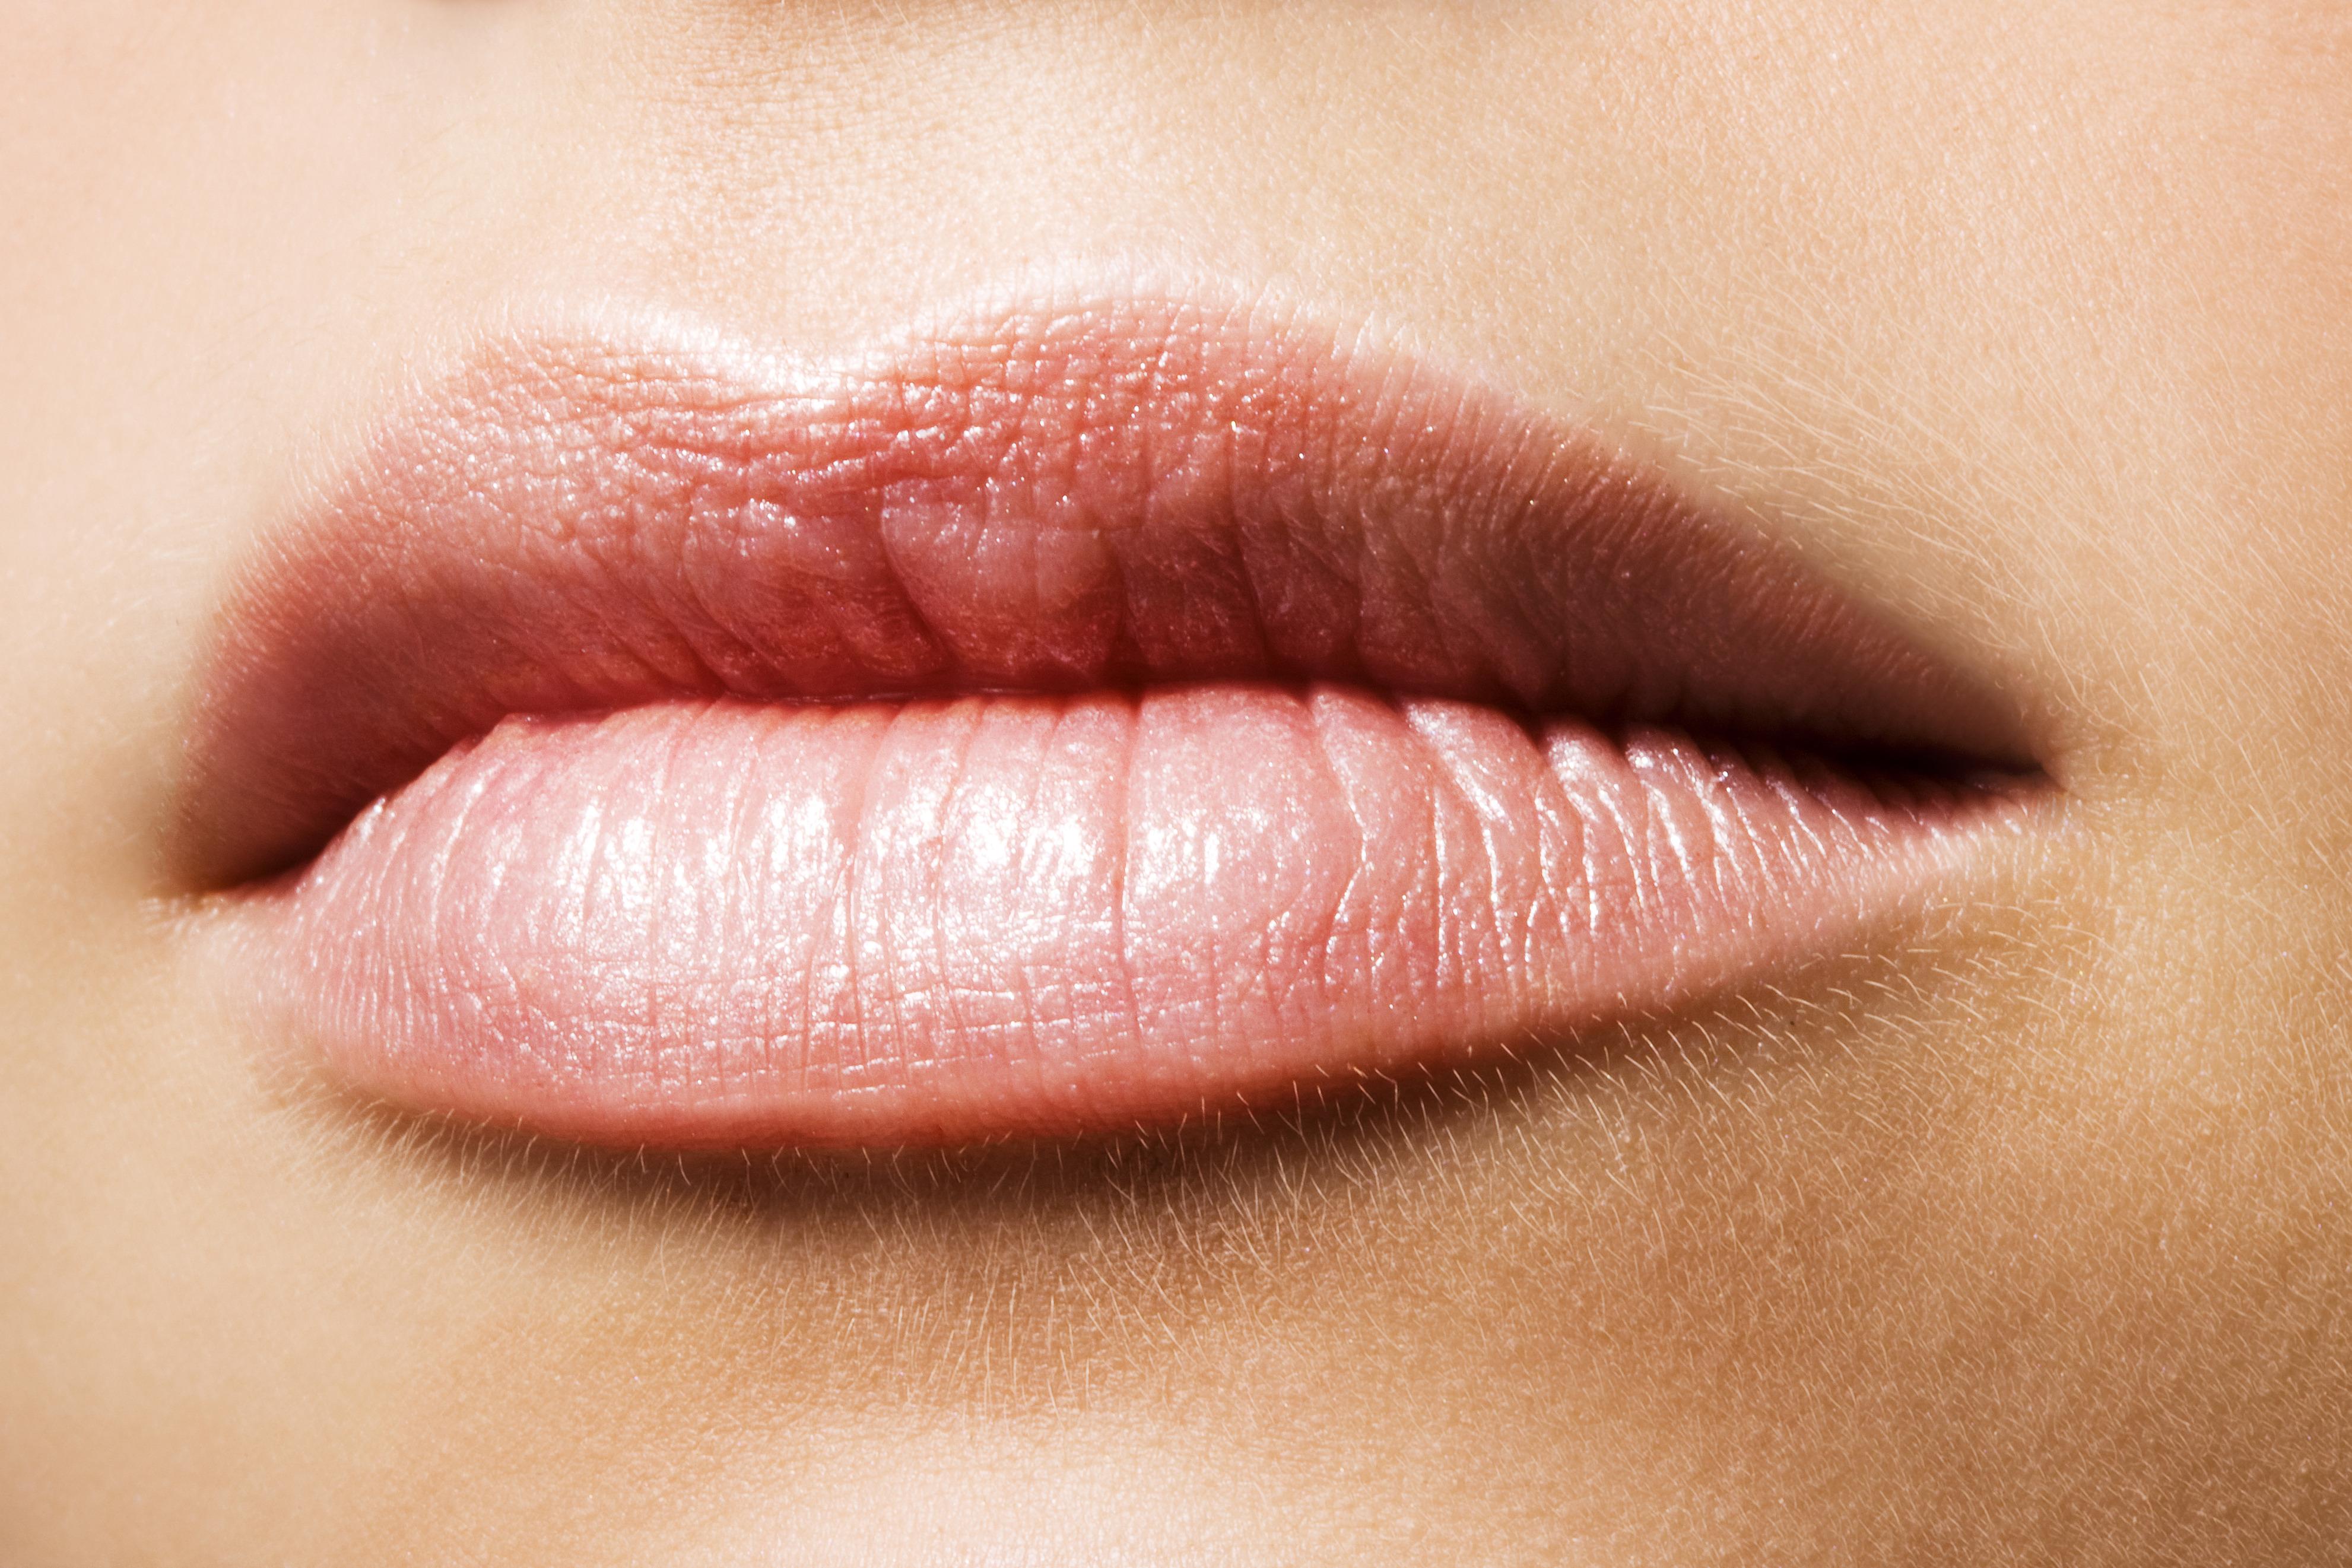 Spot On My Lip